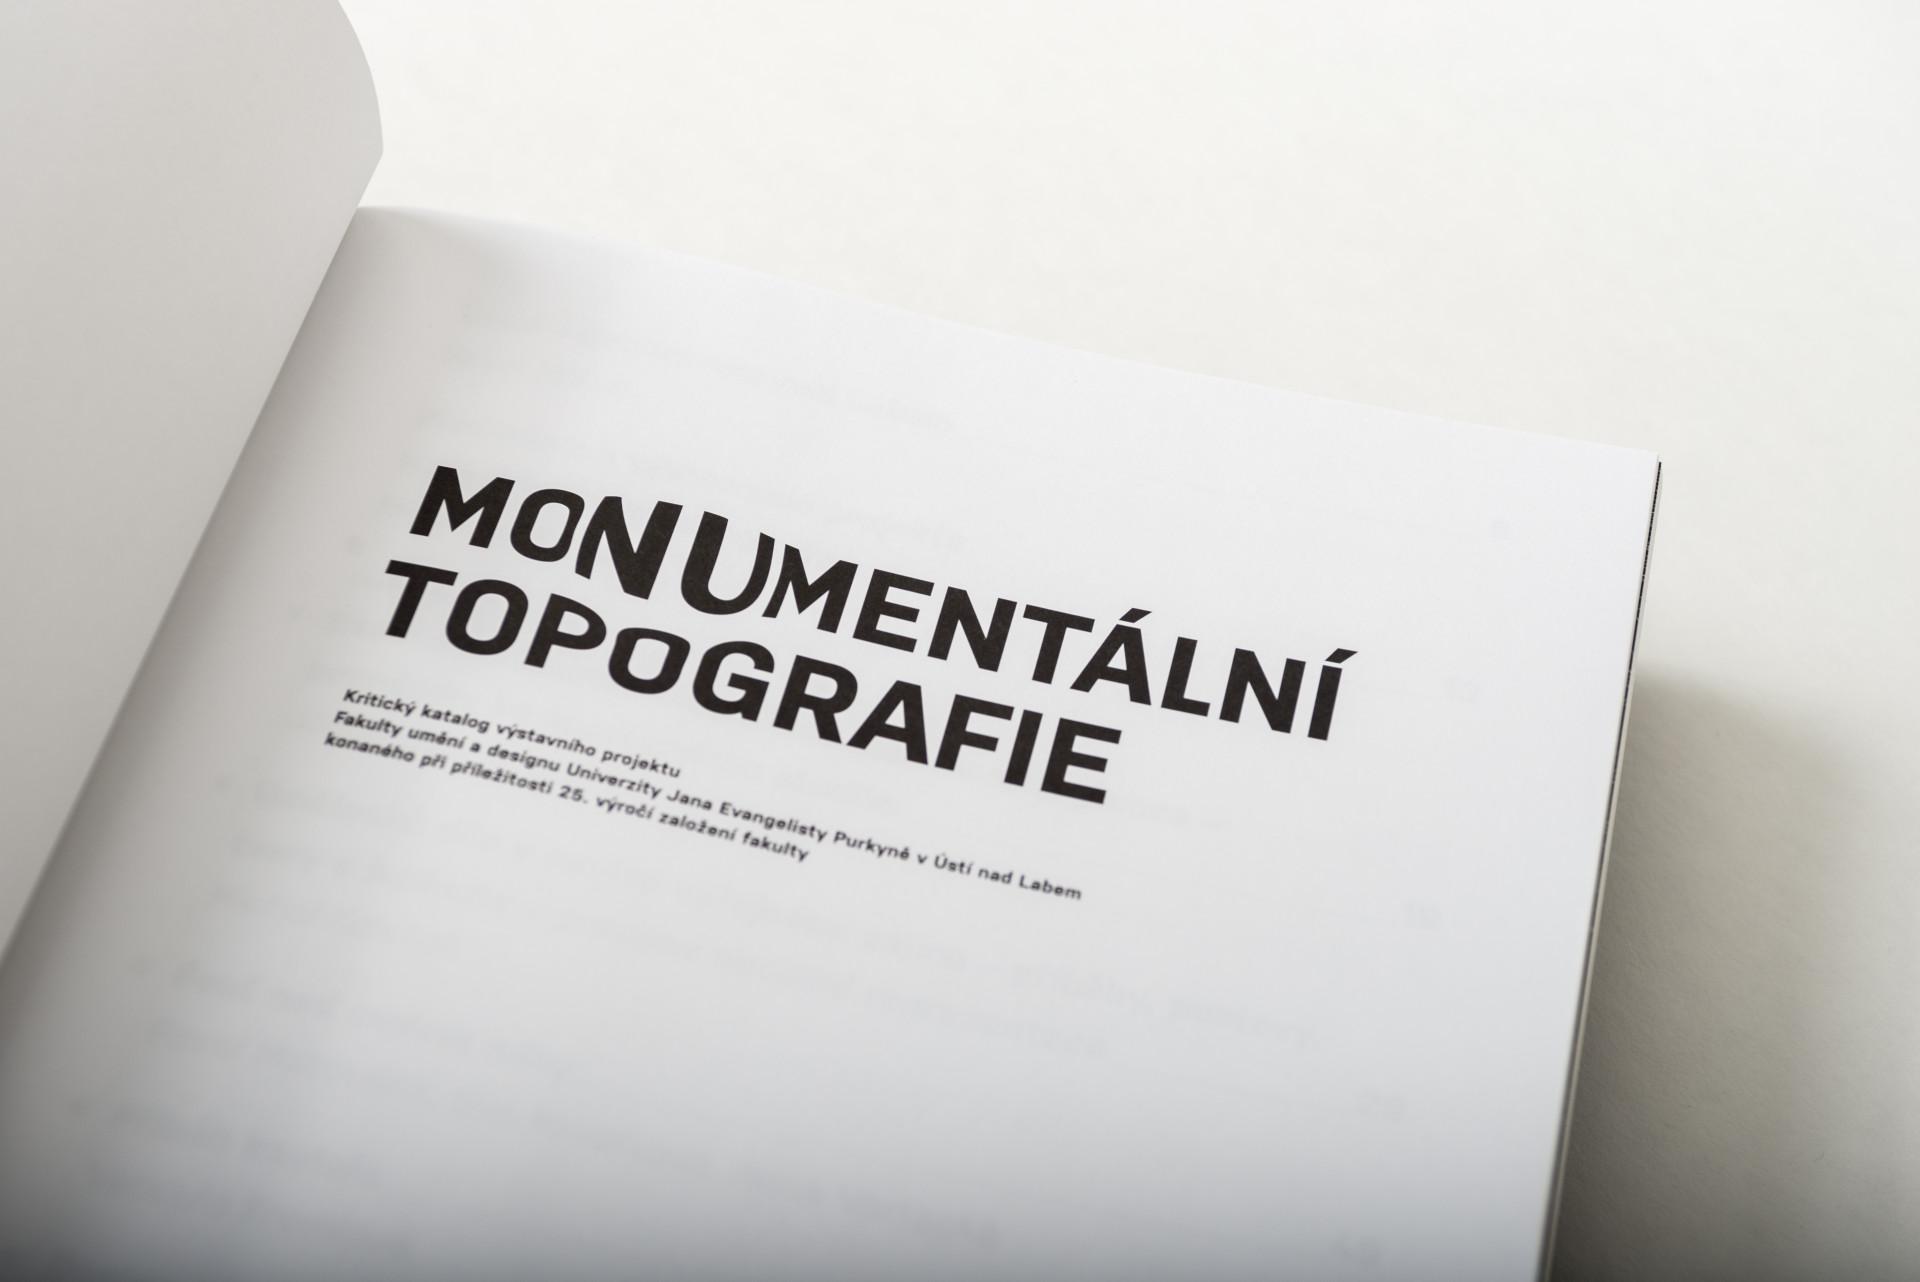 monumental_topography-7- Dany Vigil